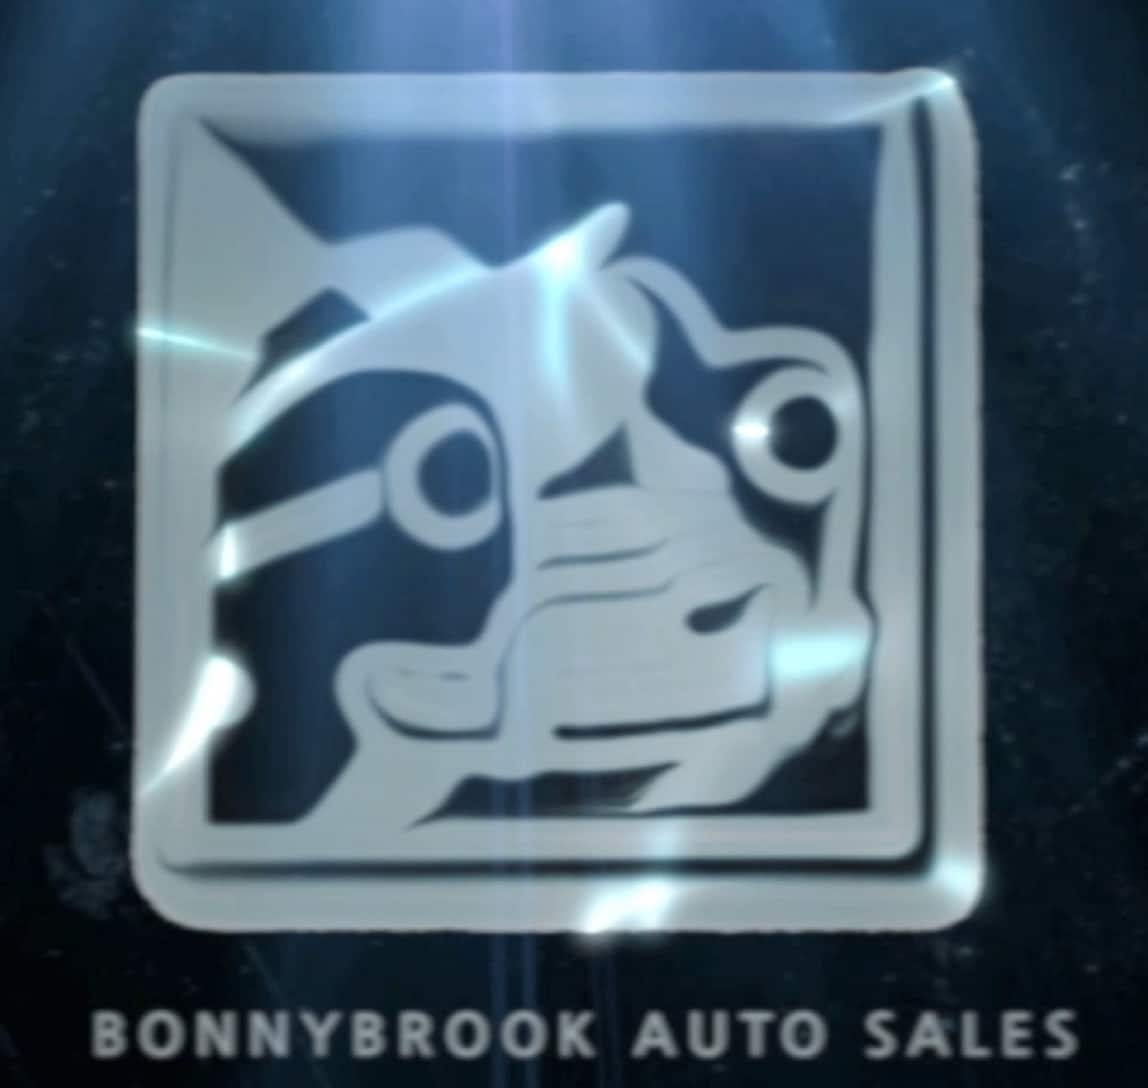 Bonnybrook Auto Sales  Service  Used dealership in Calgary AB